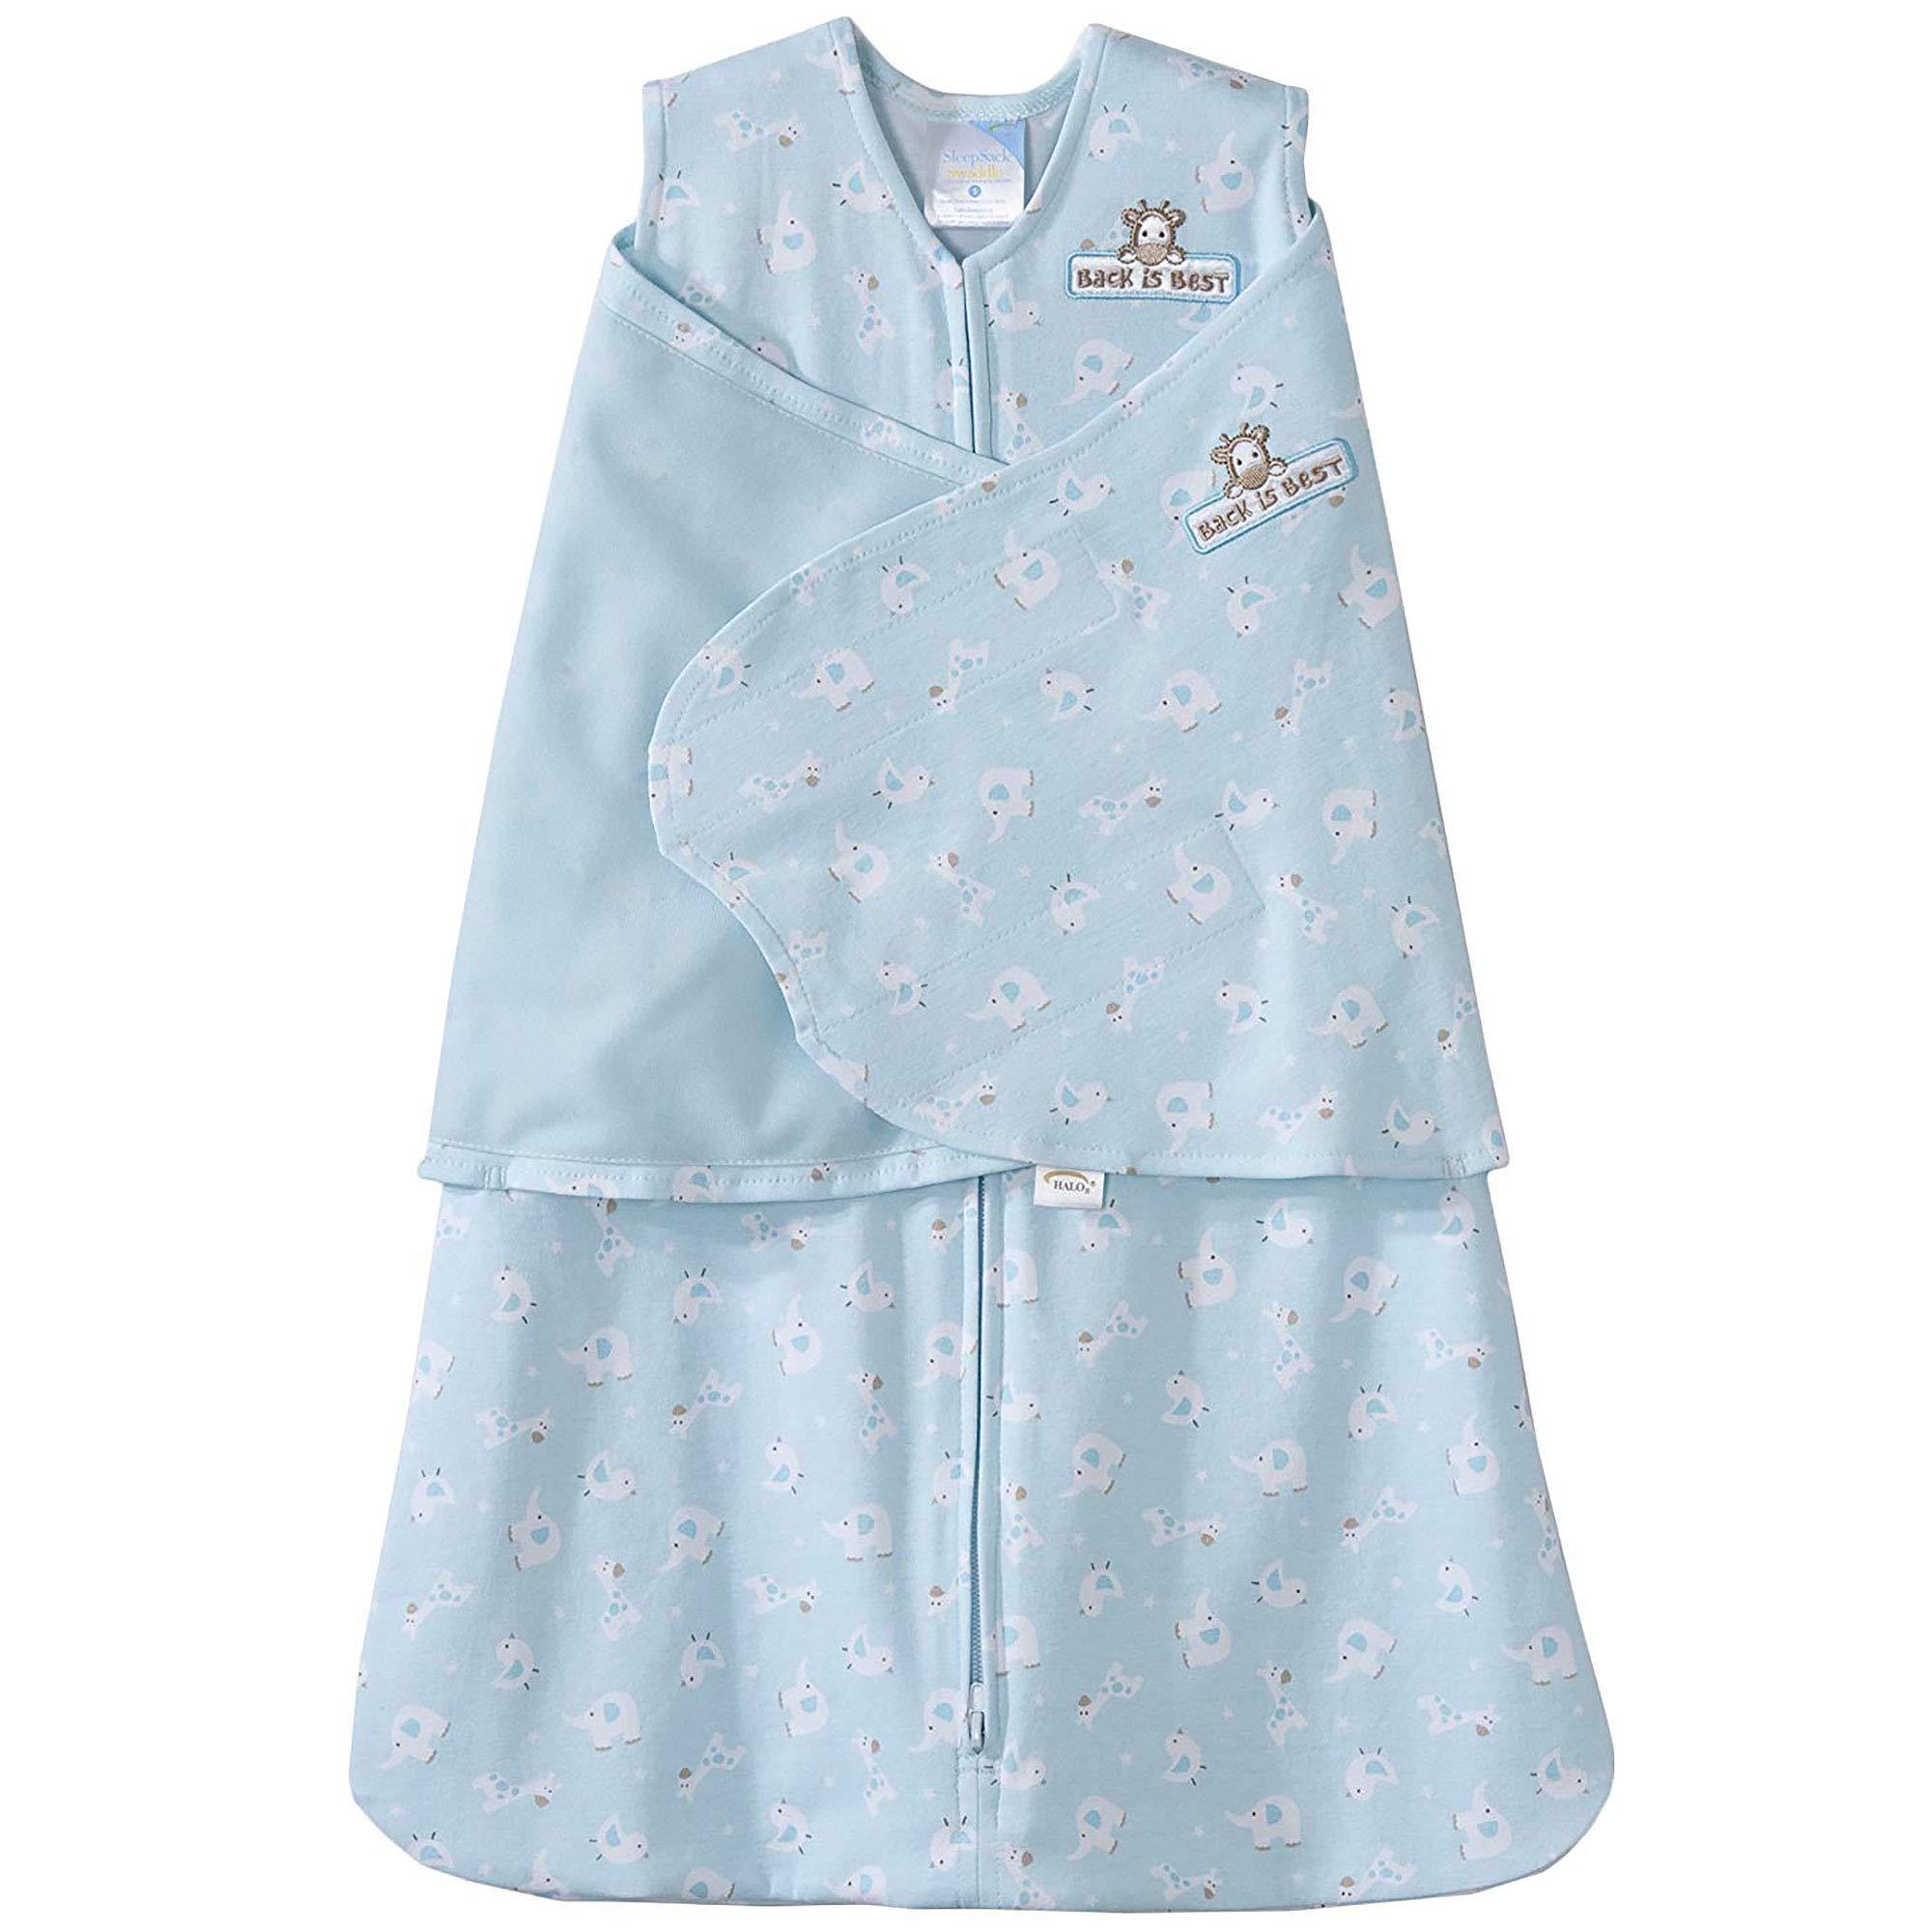 HALO 100% Cotton Sleepsack Swaddle, Turquoise Animal Friends, Small by Halo